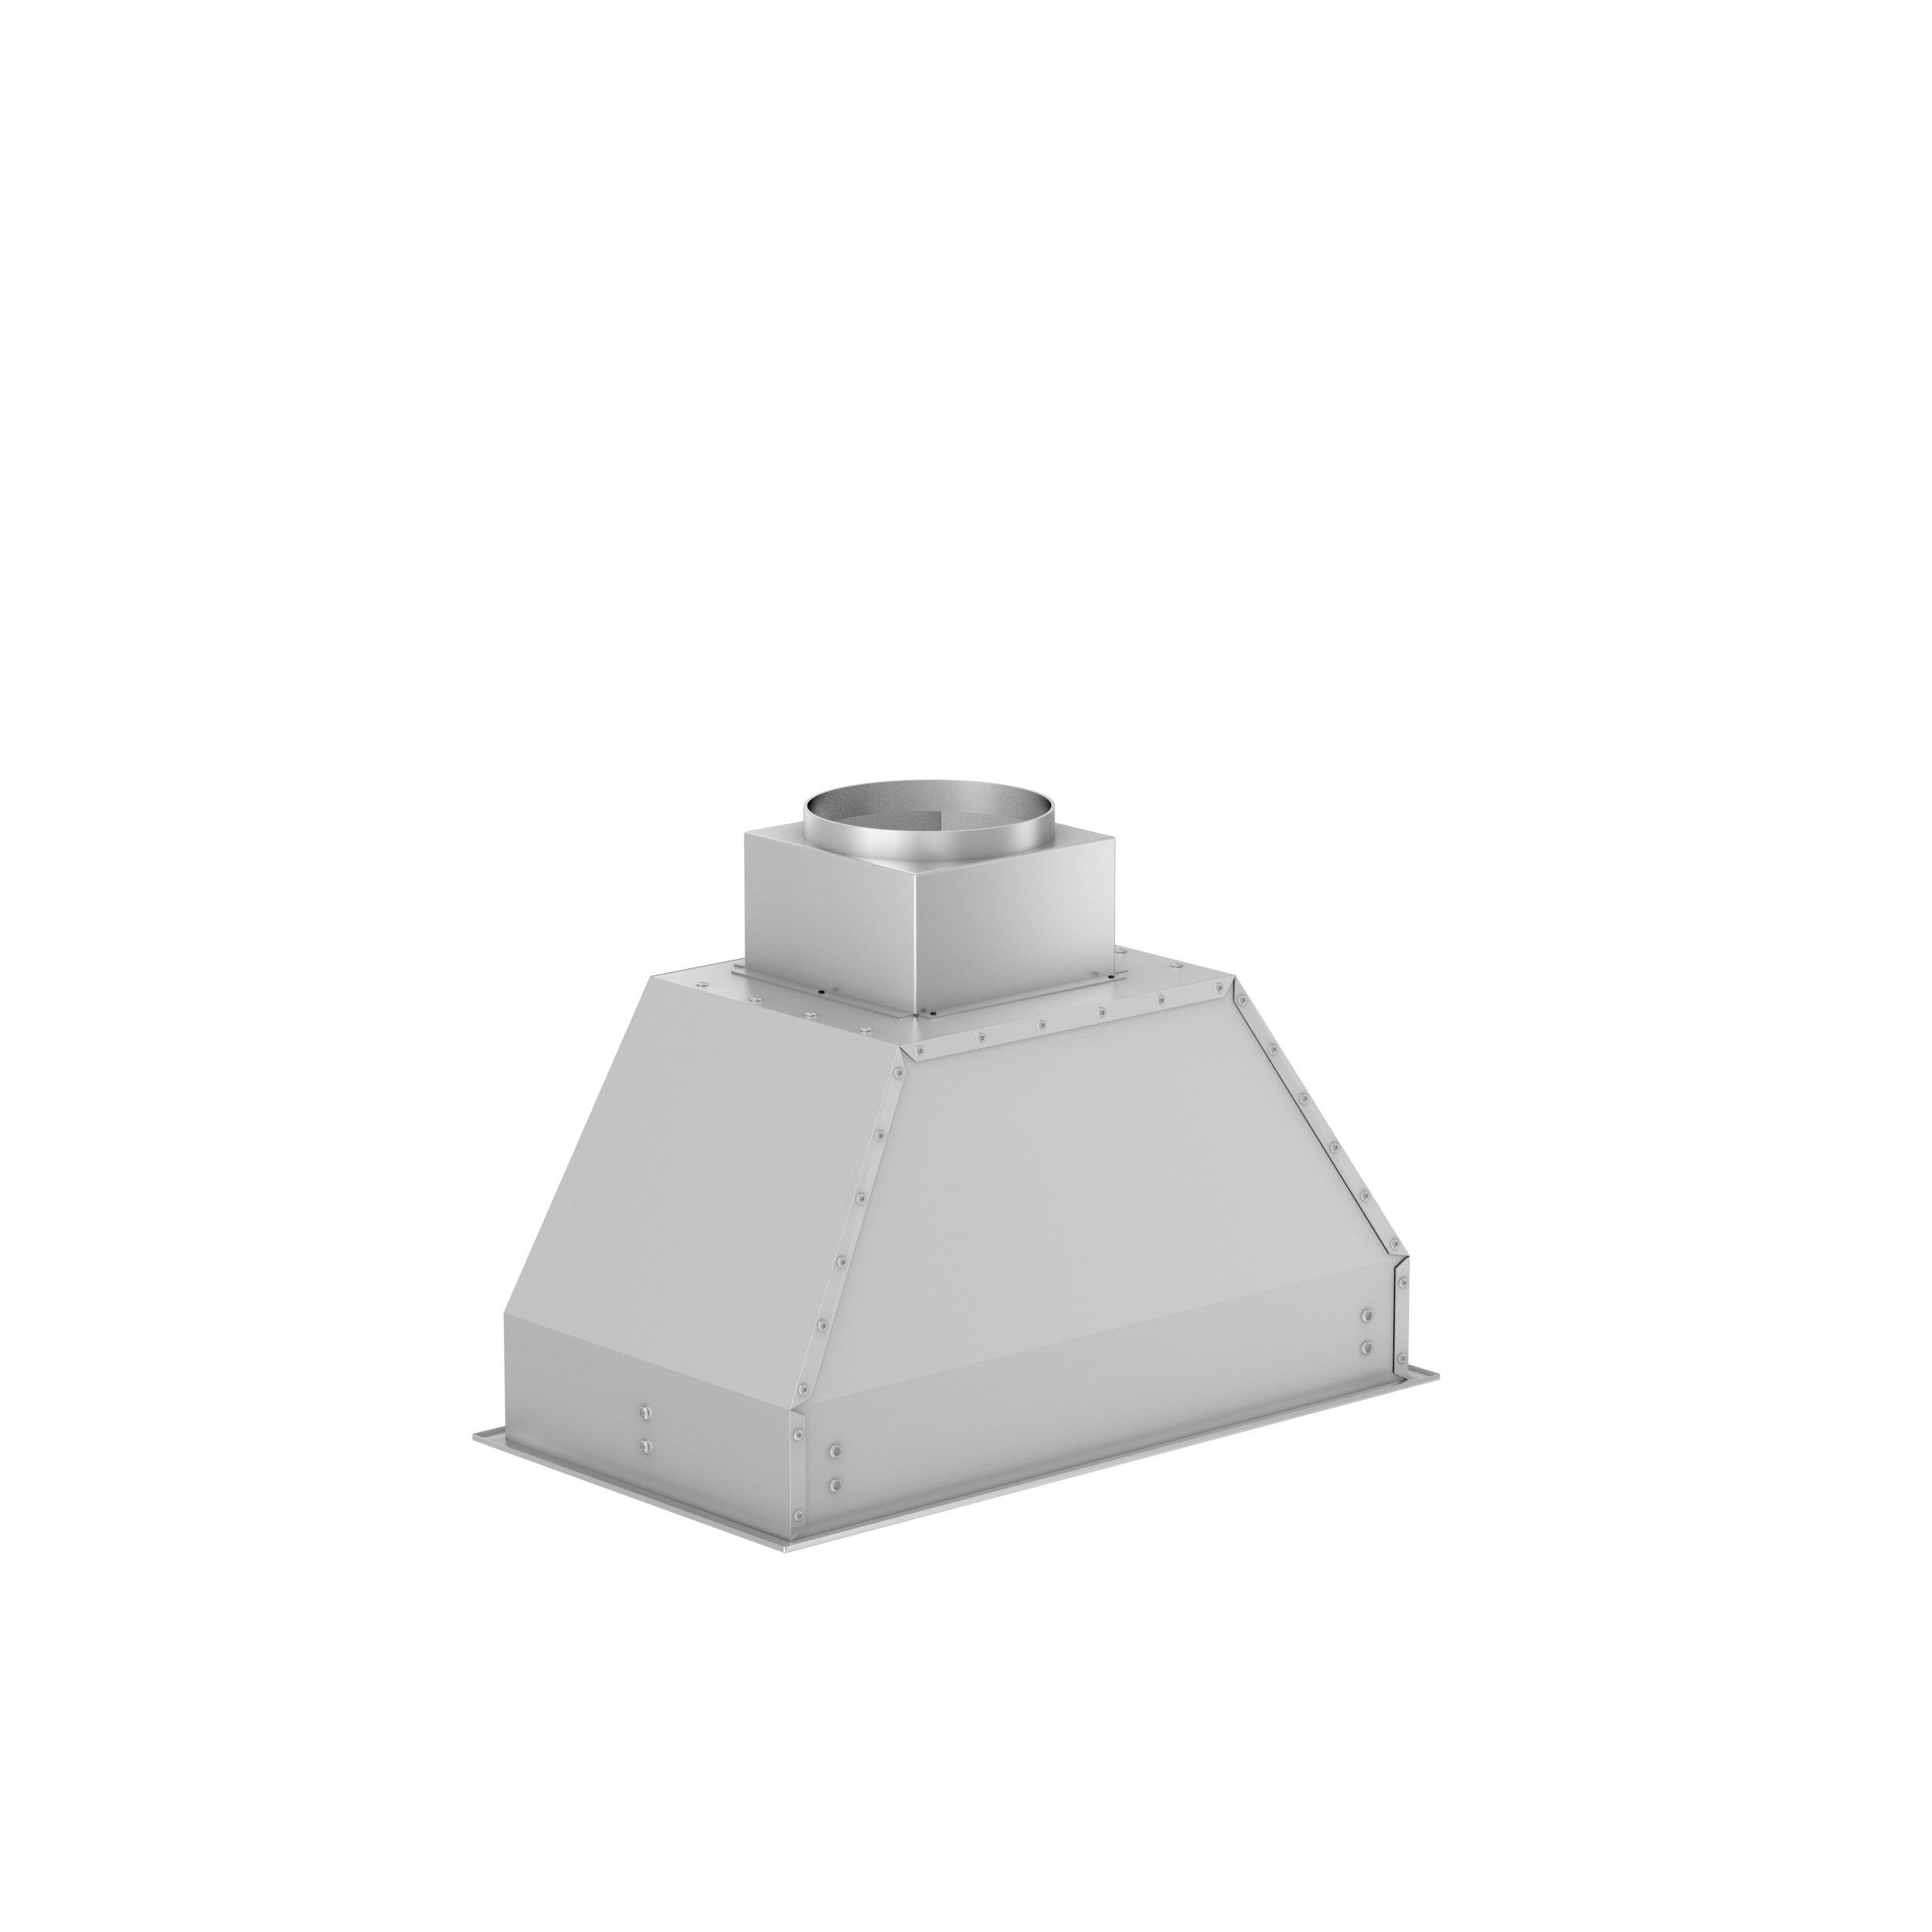 zline-stainless-steel-range-insert-695_28-top.jpeg